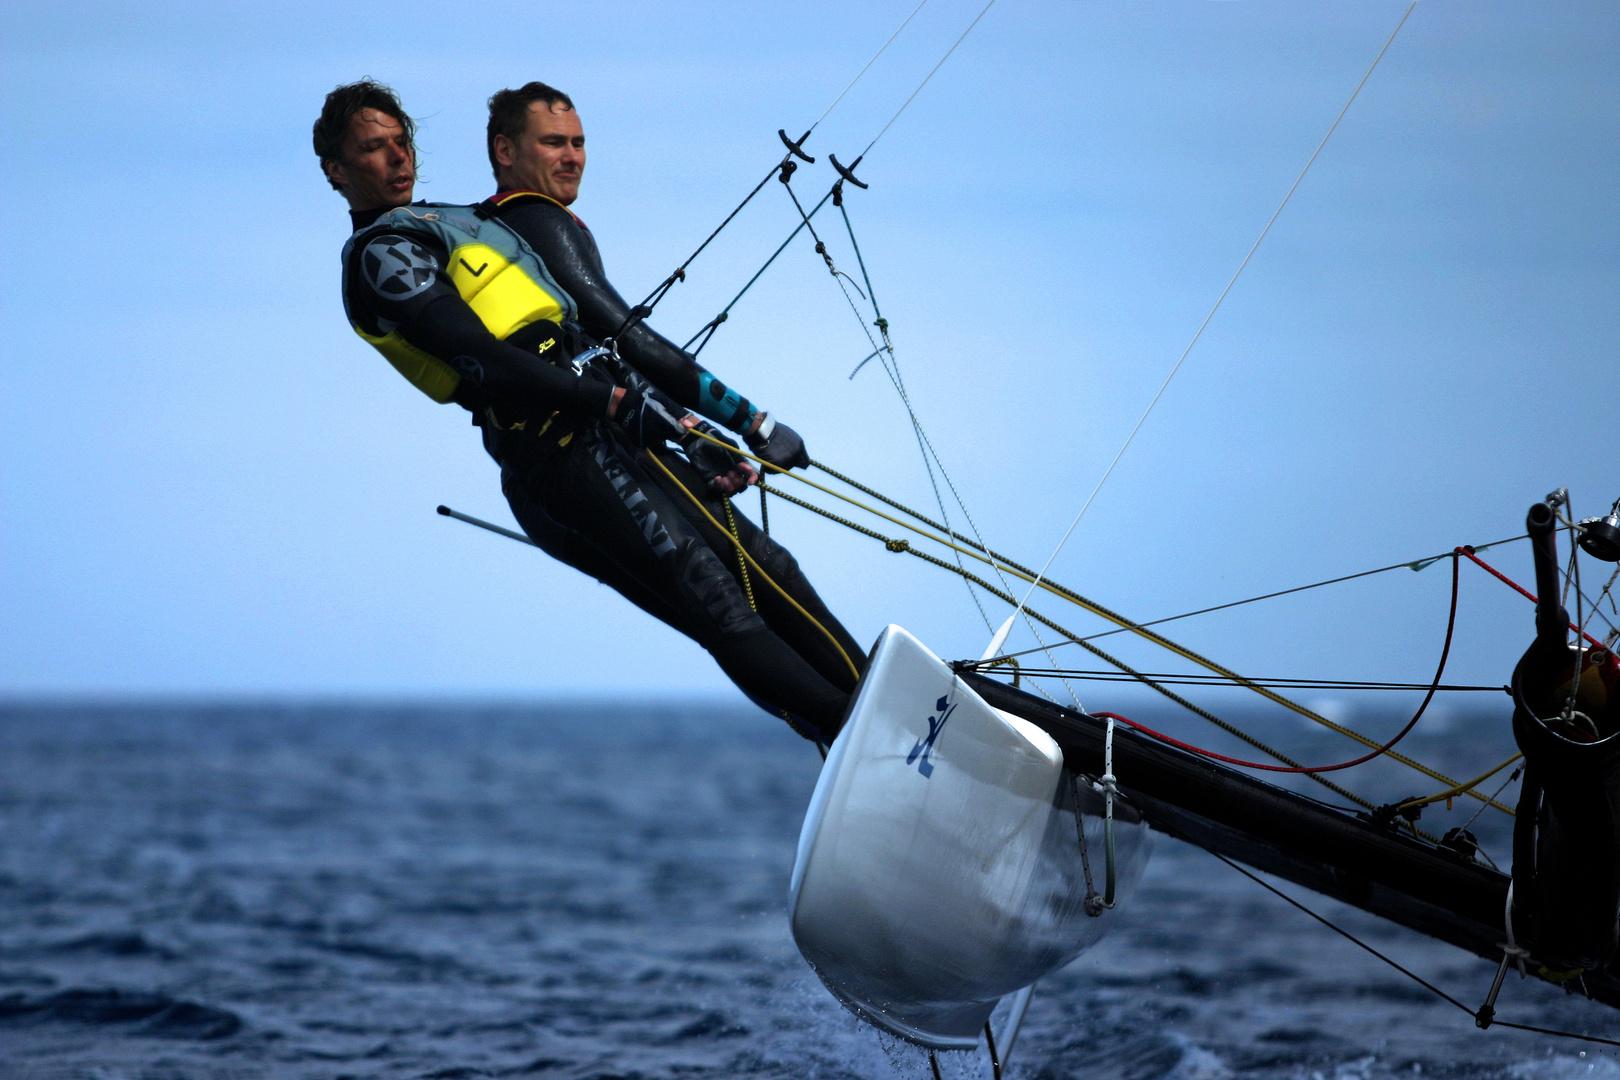 Katamaran segeln  Katamaran Segeln II Foto & Bild | sport, segel- surf ...